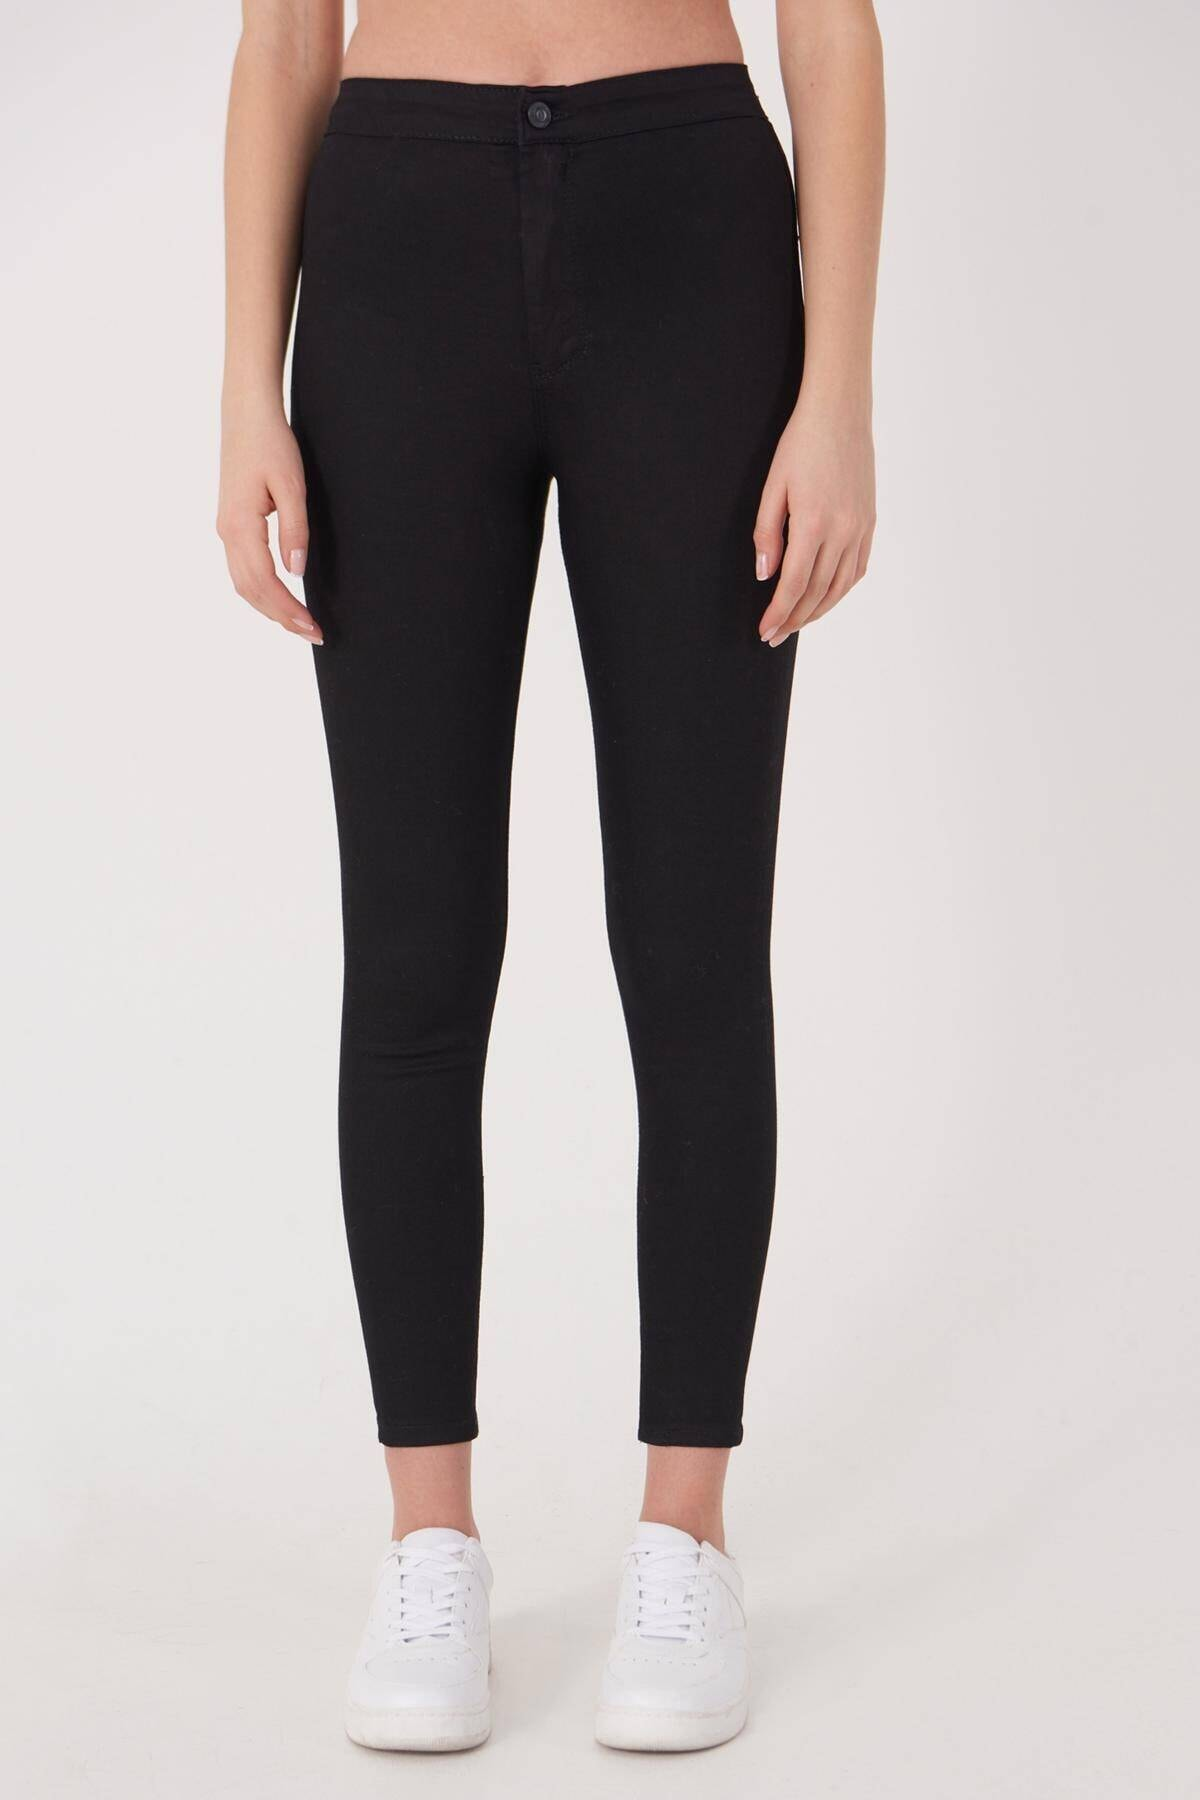 Addax Kadın Siyah Yüksek Bel Pantolon Pn10915 - G8Pnn Adx-0000013630 1